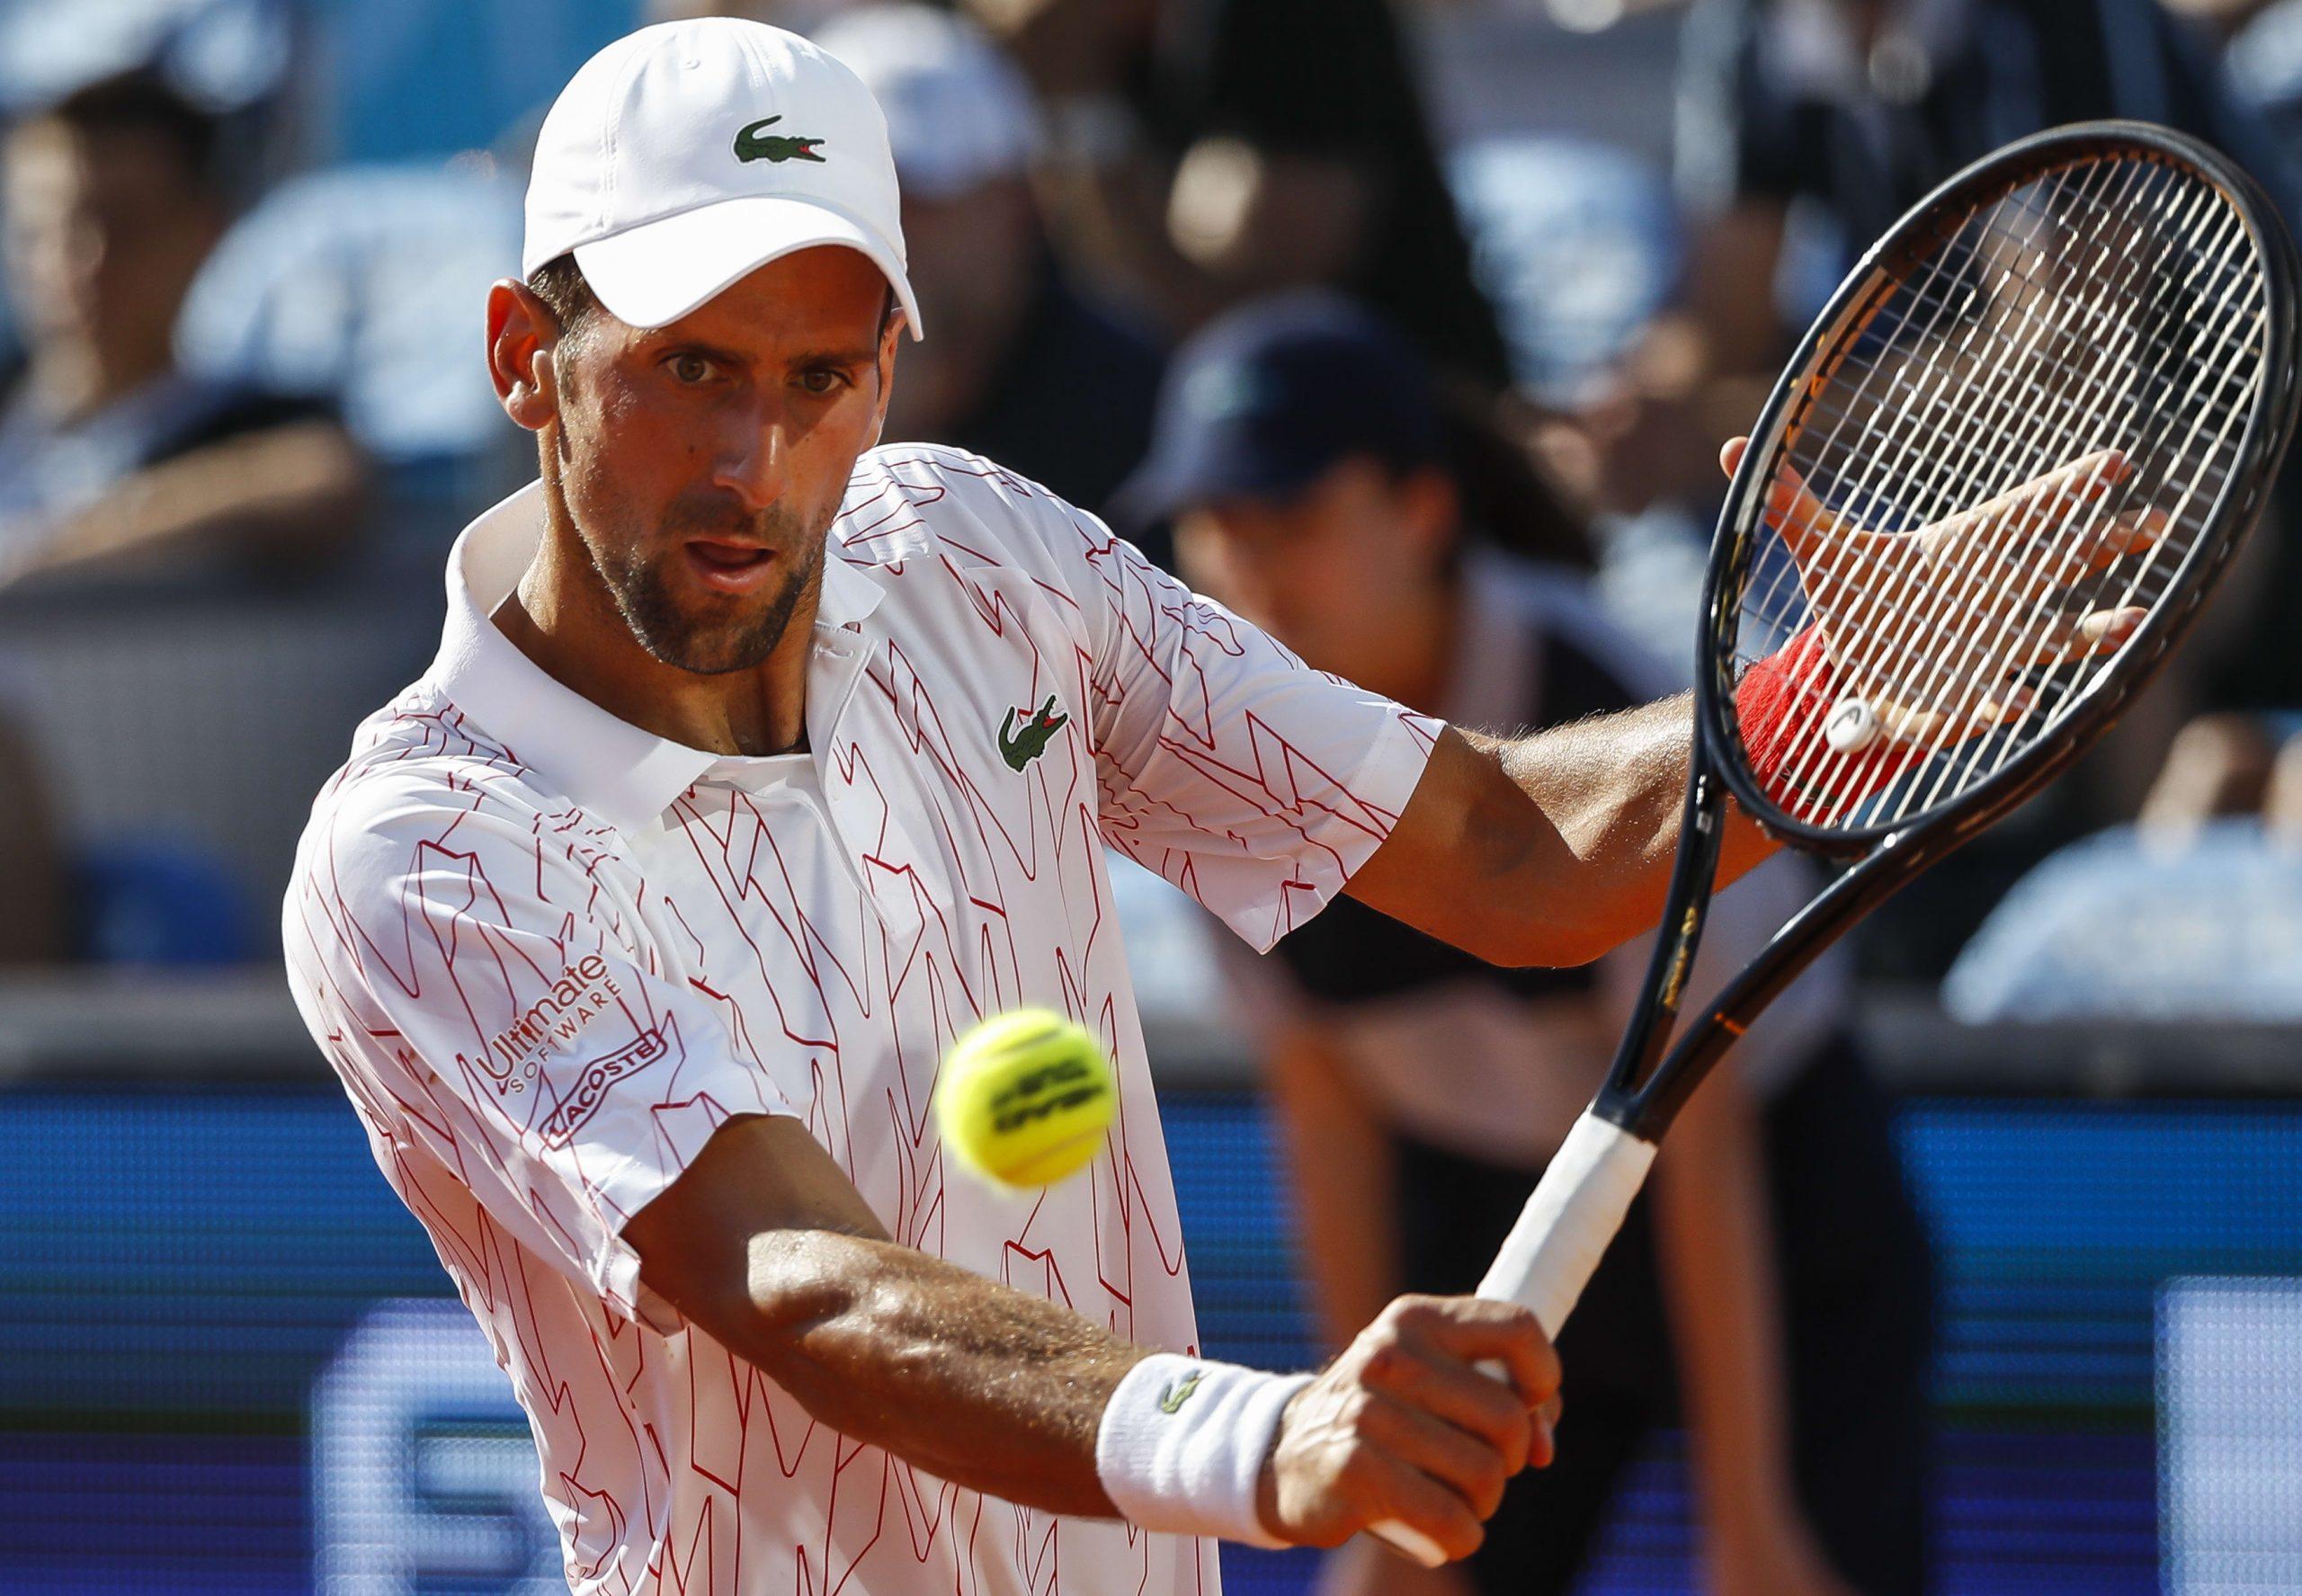 Novak Djokovic Says He's Victim Of COVID-19 'Witch Hunt' After Doomed Tourney